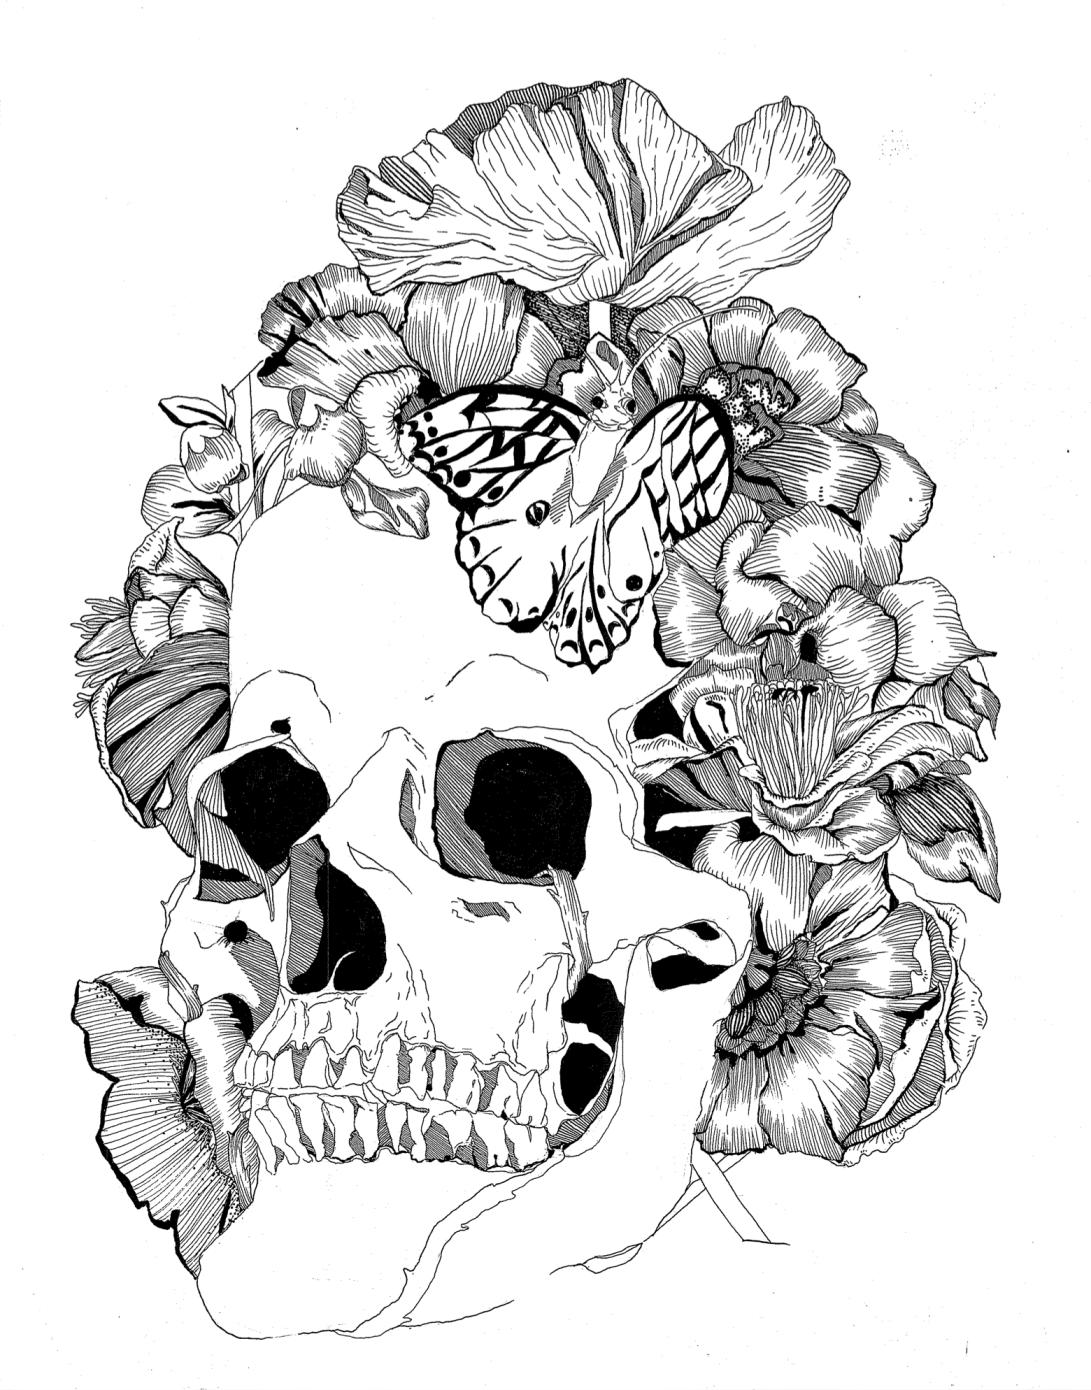 Pen & Ink on Paper